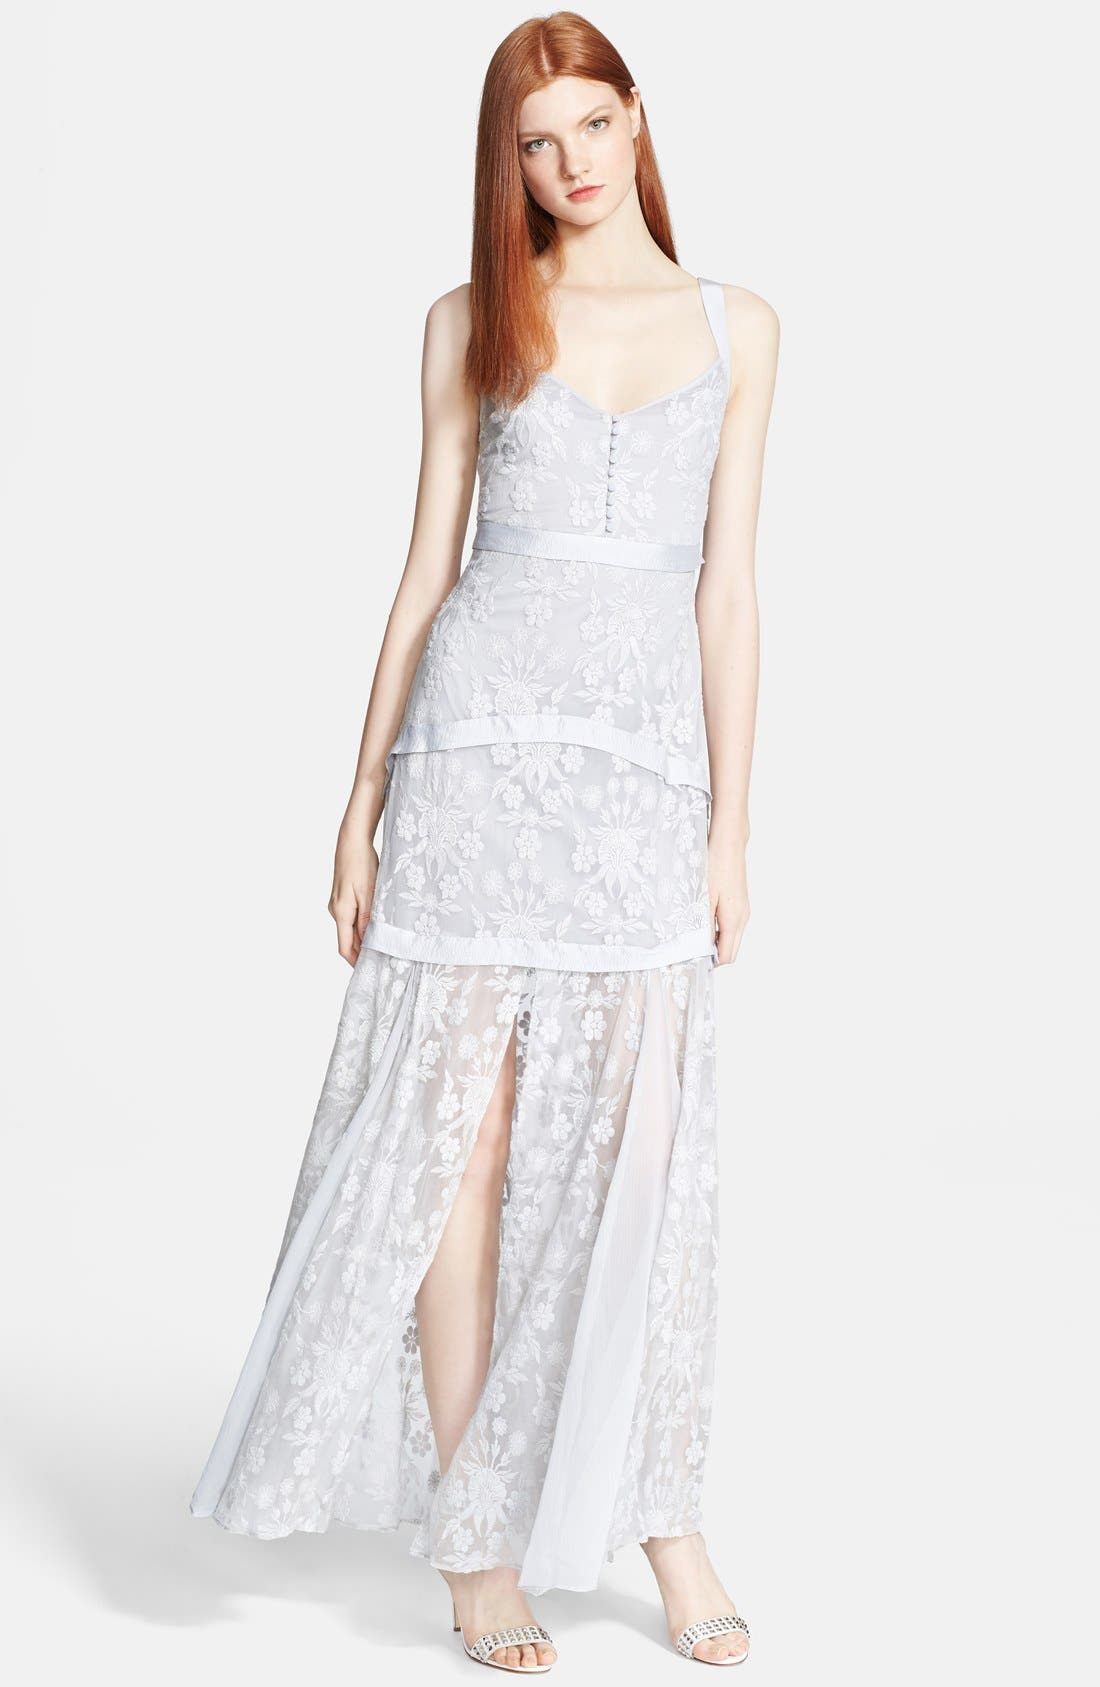 Main Image - Elizabeth and James 'Lise' Long Silk Lace Dress